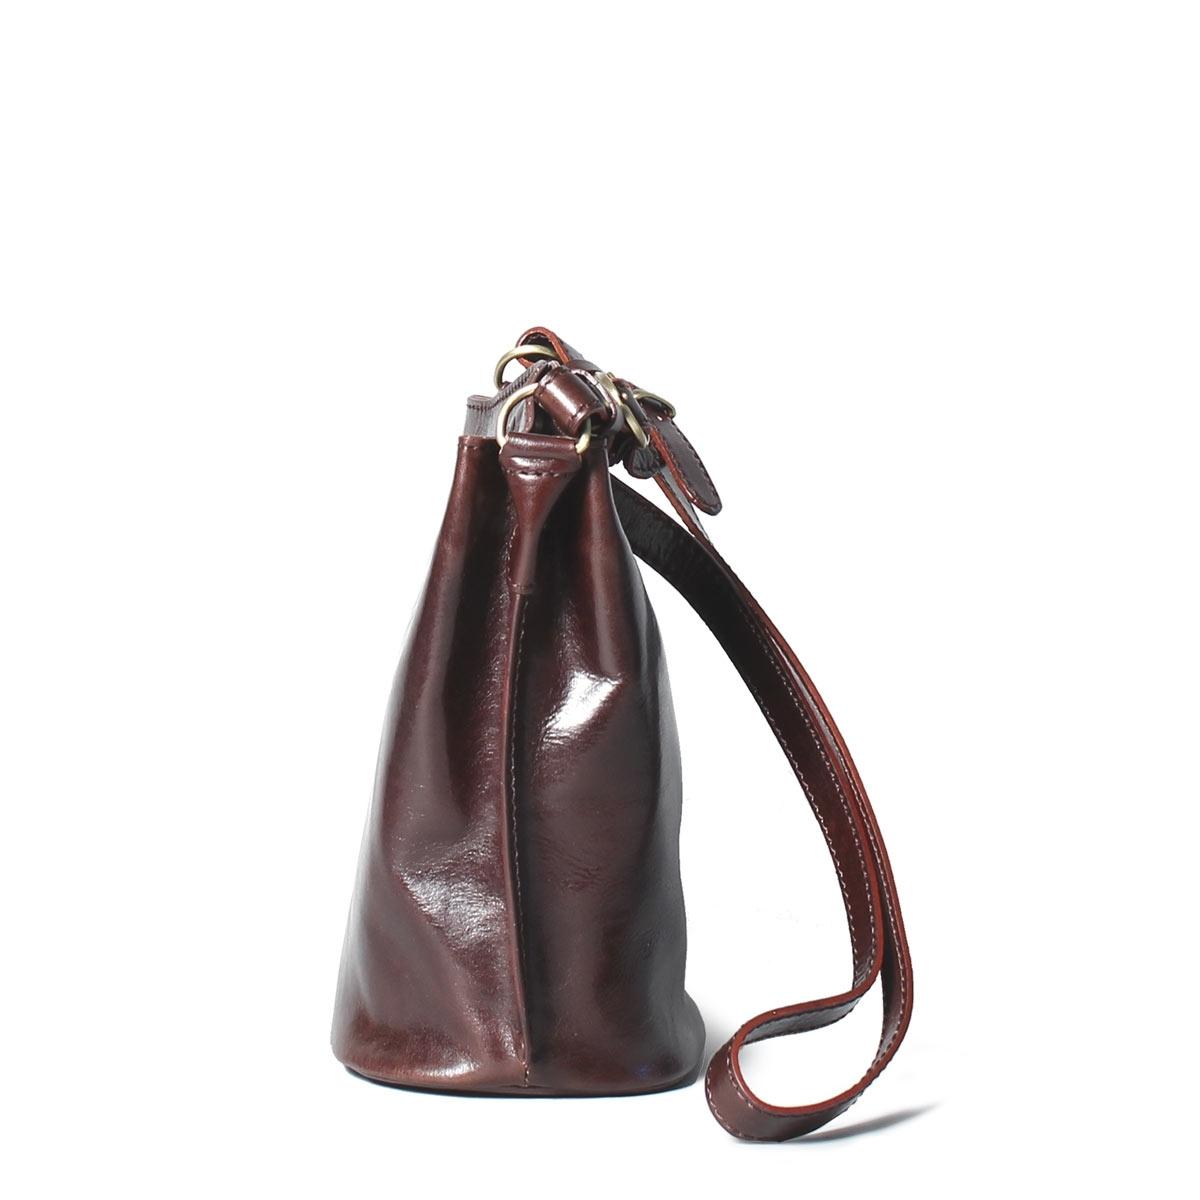 MAXWELL SCOTT BAGS Ladies Rich Brown Italian Leather Bucket Bag